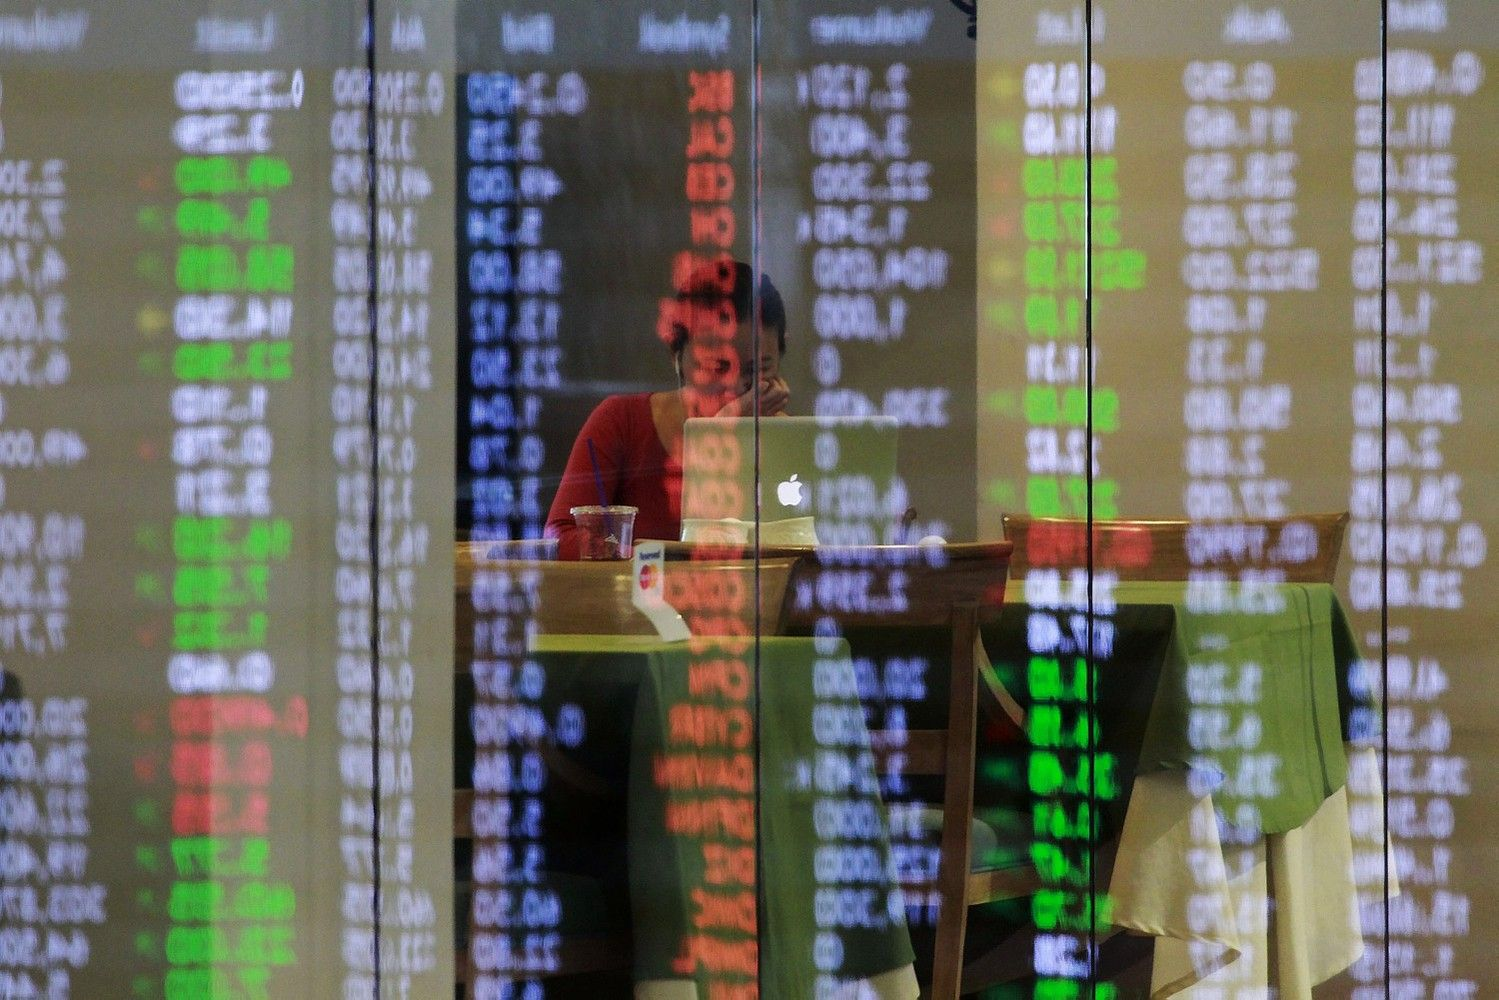 Asia Stocks Fall After Stellar Run; Korea Tumbles: Markets Wrap